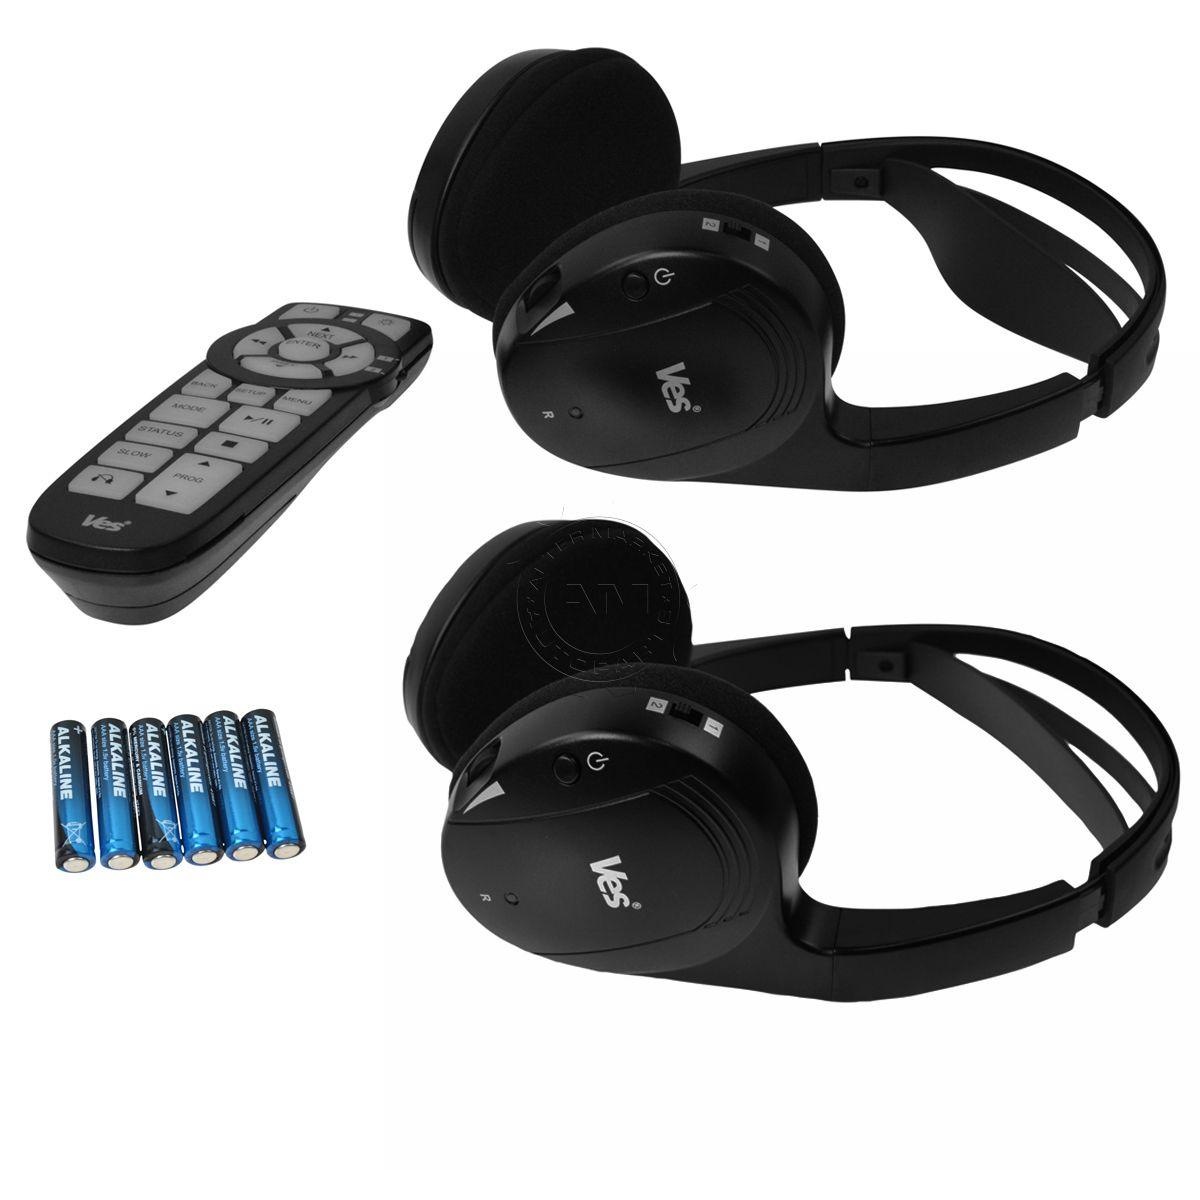 OEM 82213176 VES Wireless Headphones Remote Control Kit for Chrysler Dodge  Jeep